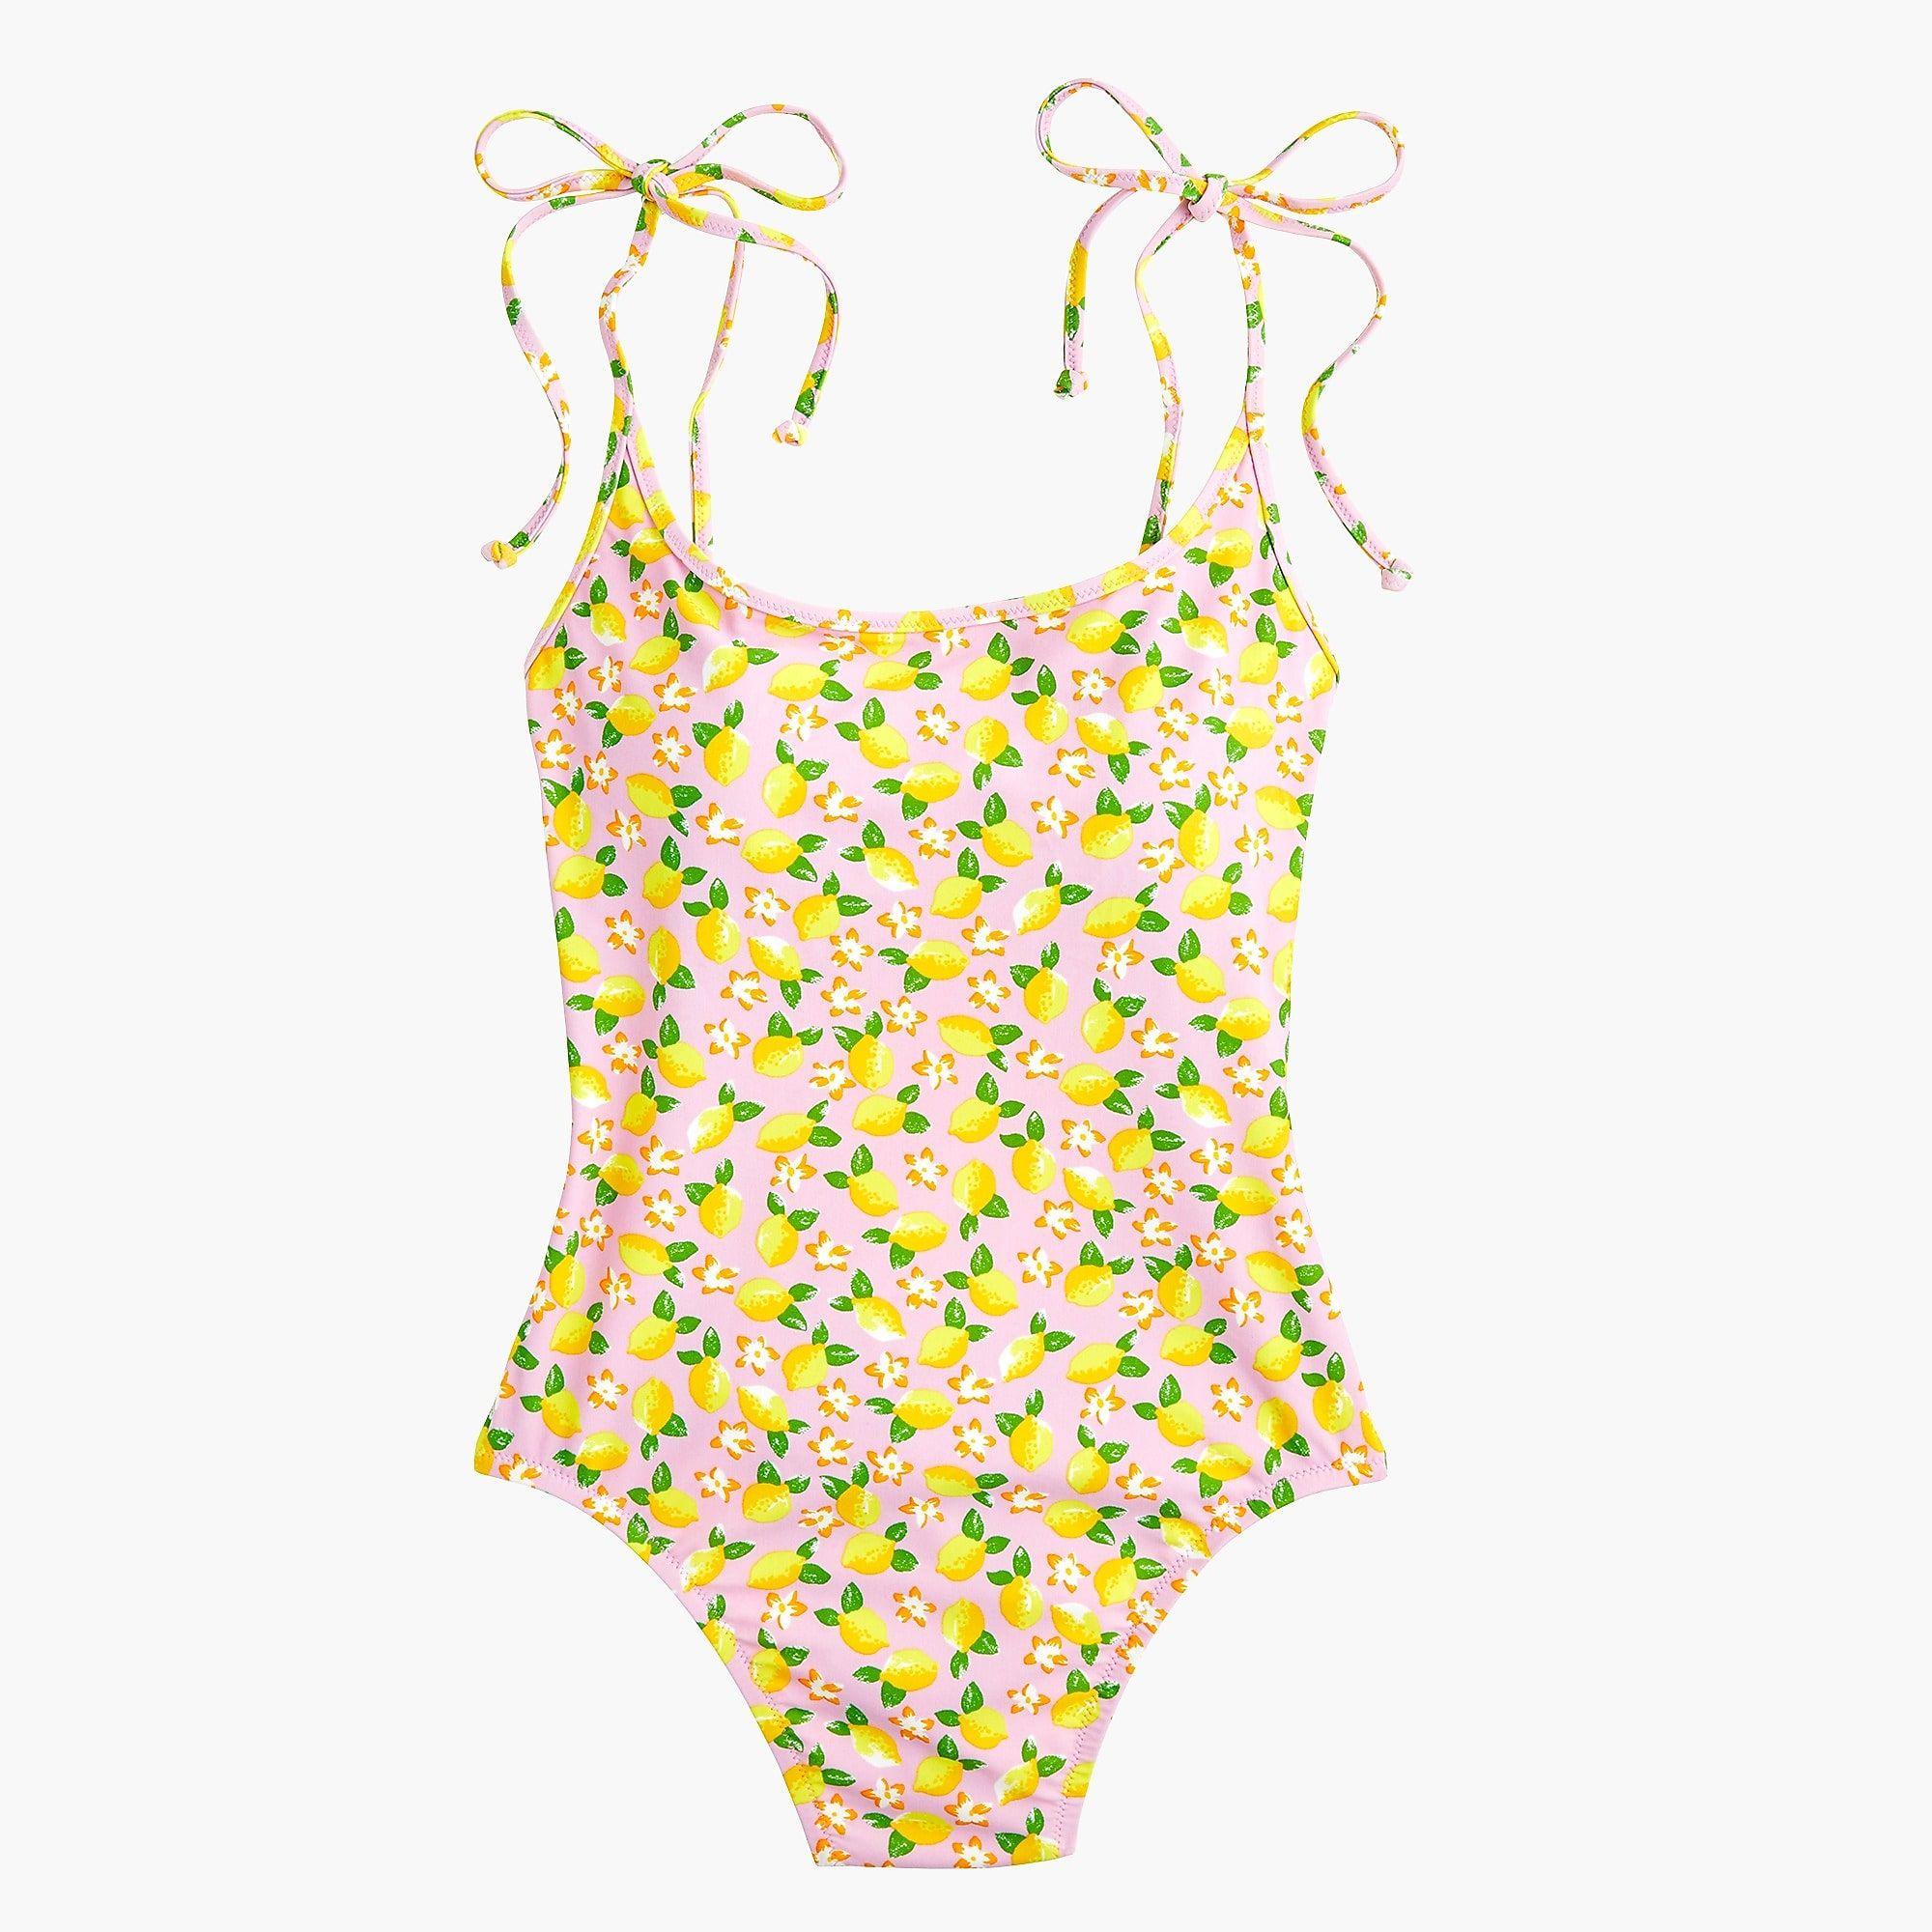 6c60bb873f J.Crew - Shoulder-tie one-piece swimsuit in lemon print. Shop the Women's  ...